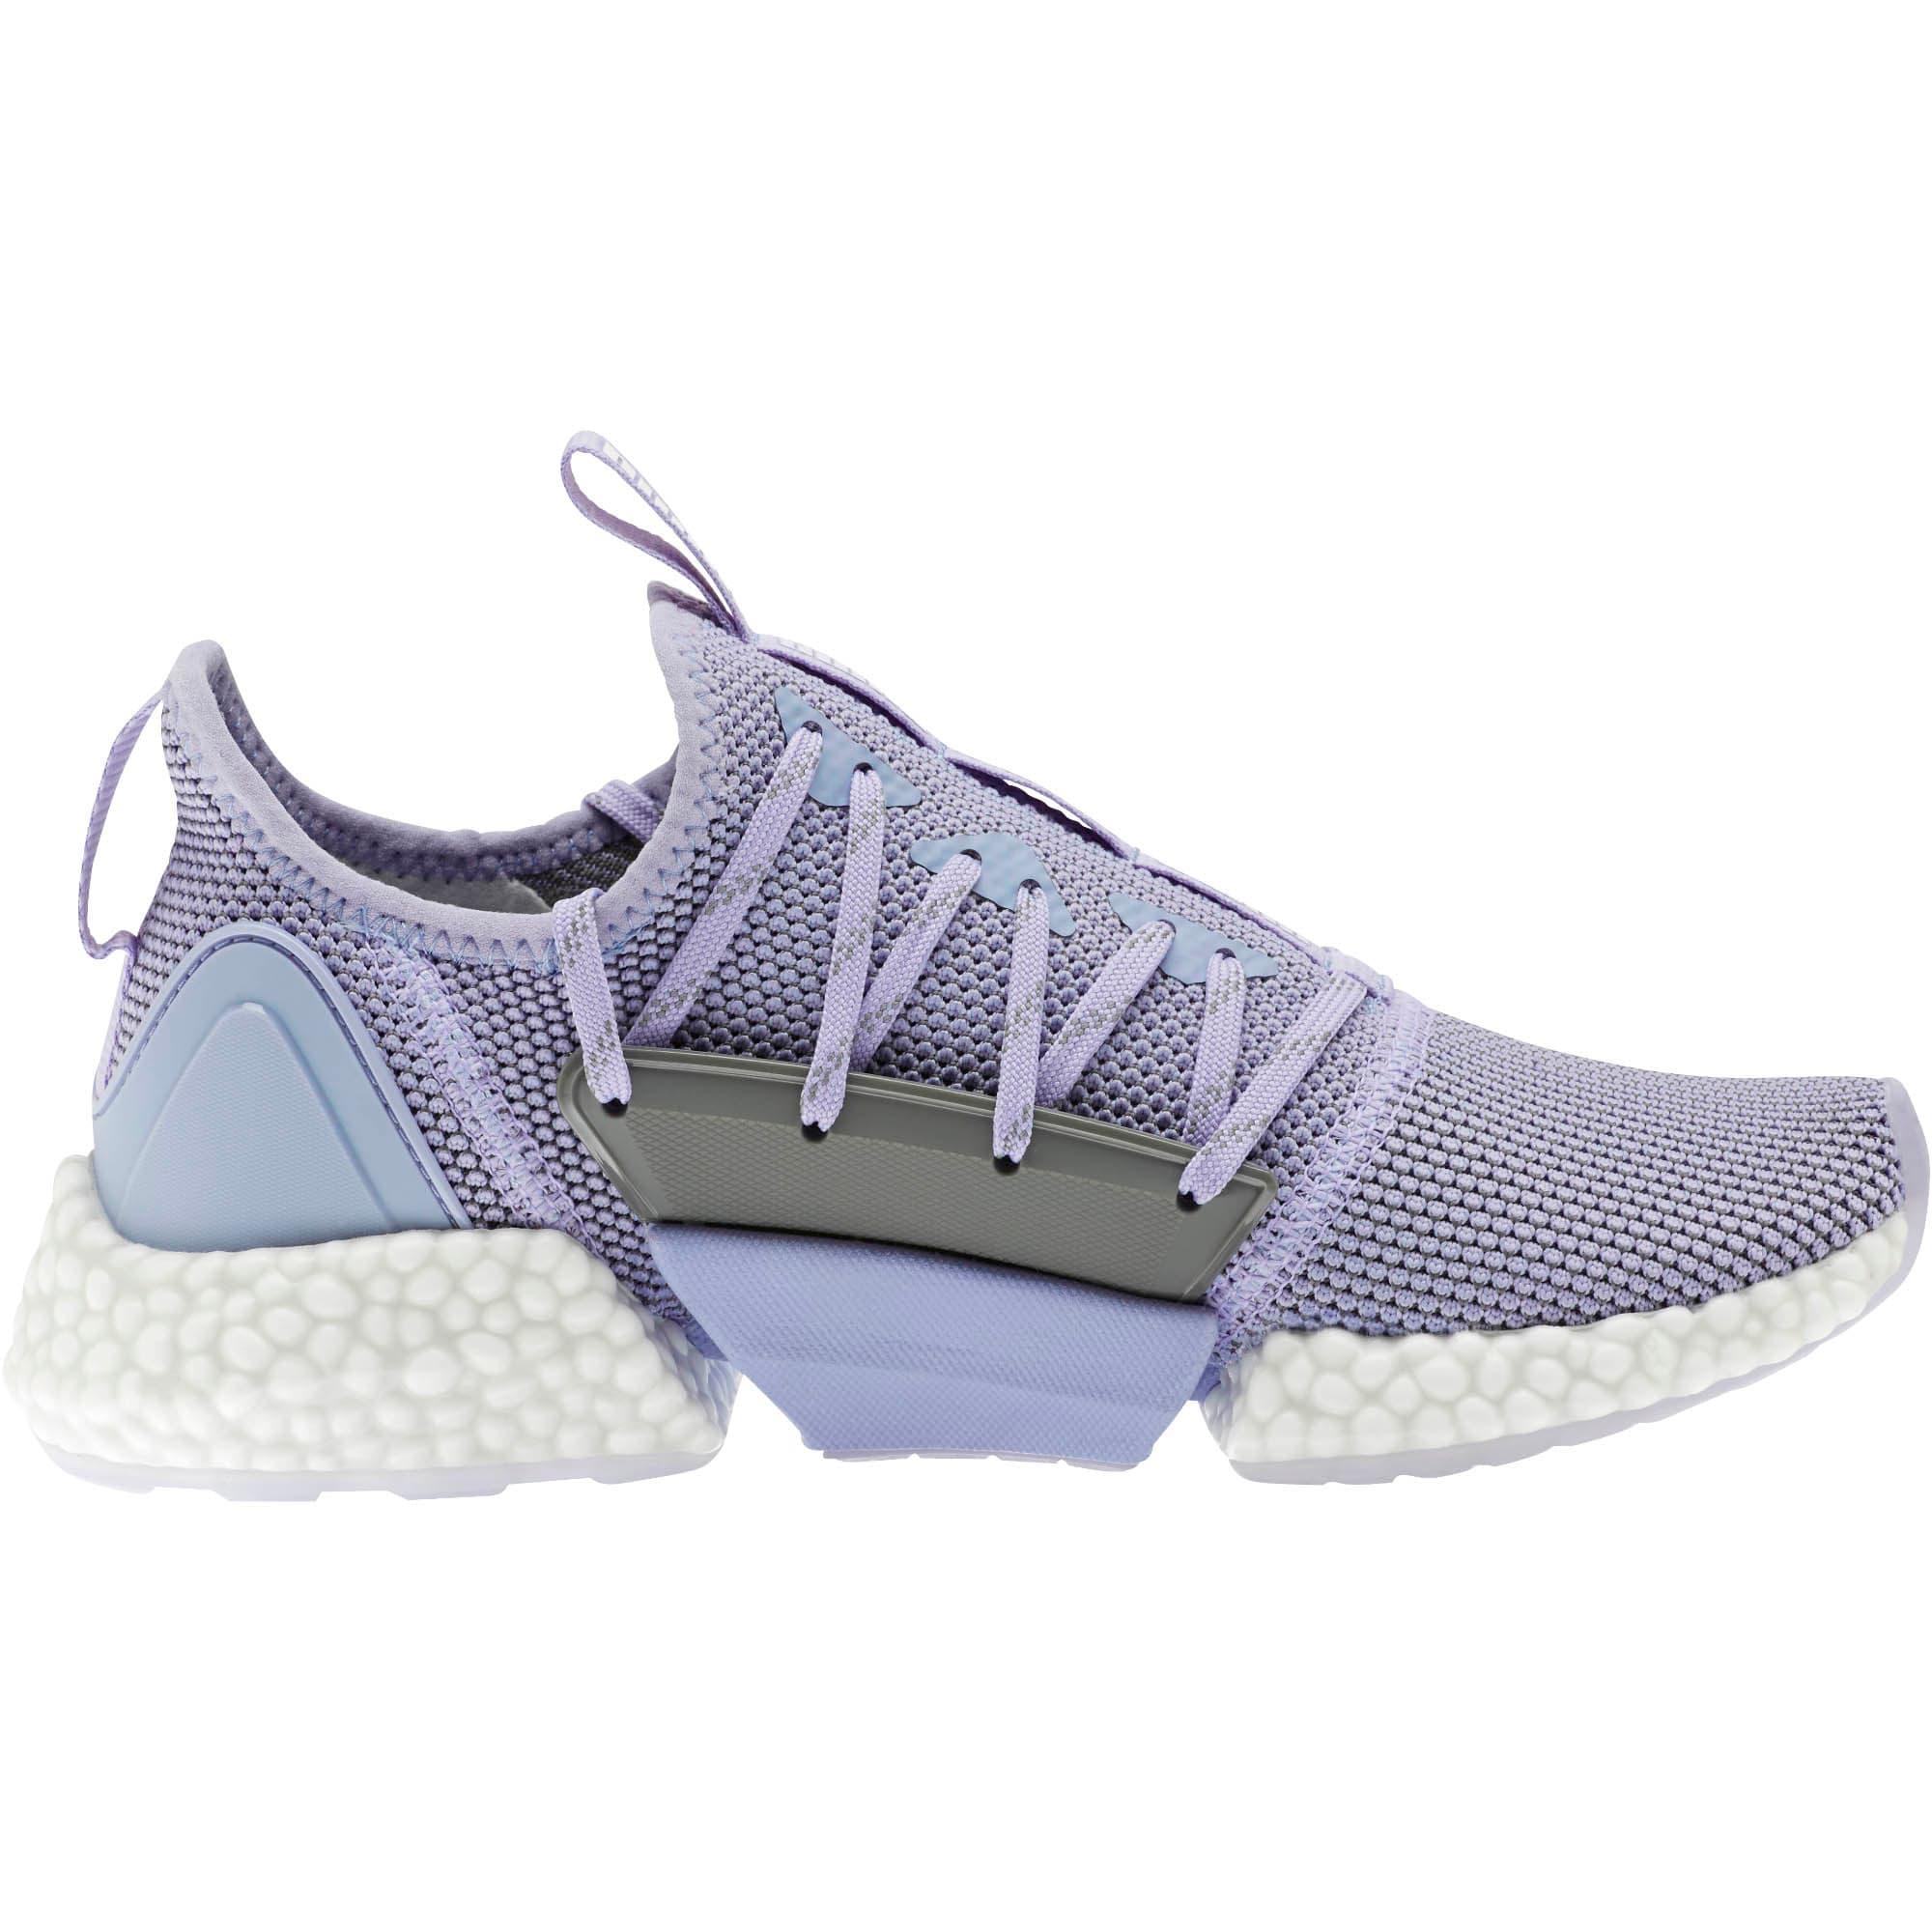 Thumbnail 4 of HYBRID Rocket Runner Women's Running Shoes, Sweet Lavender-Puma White, medium